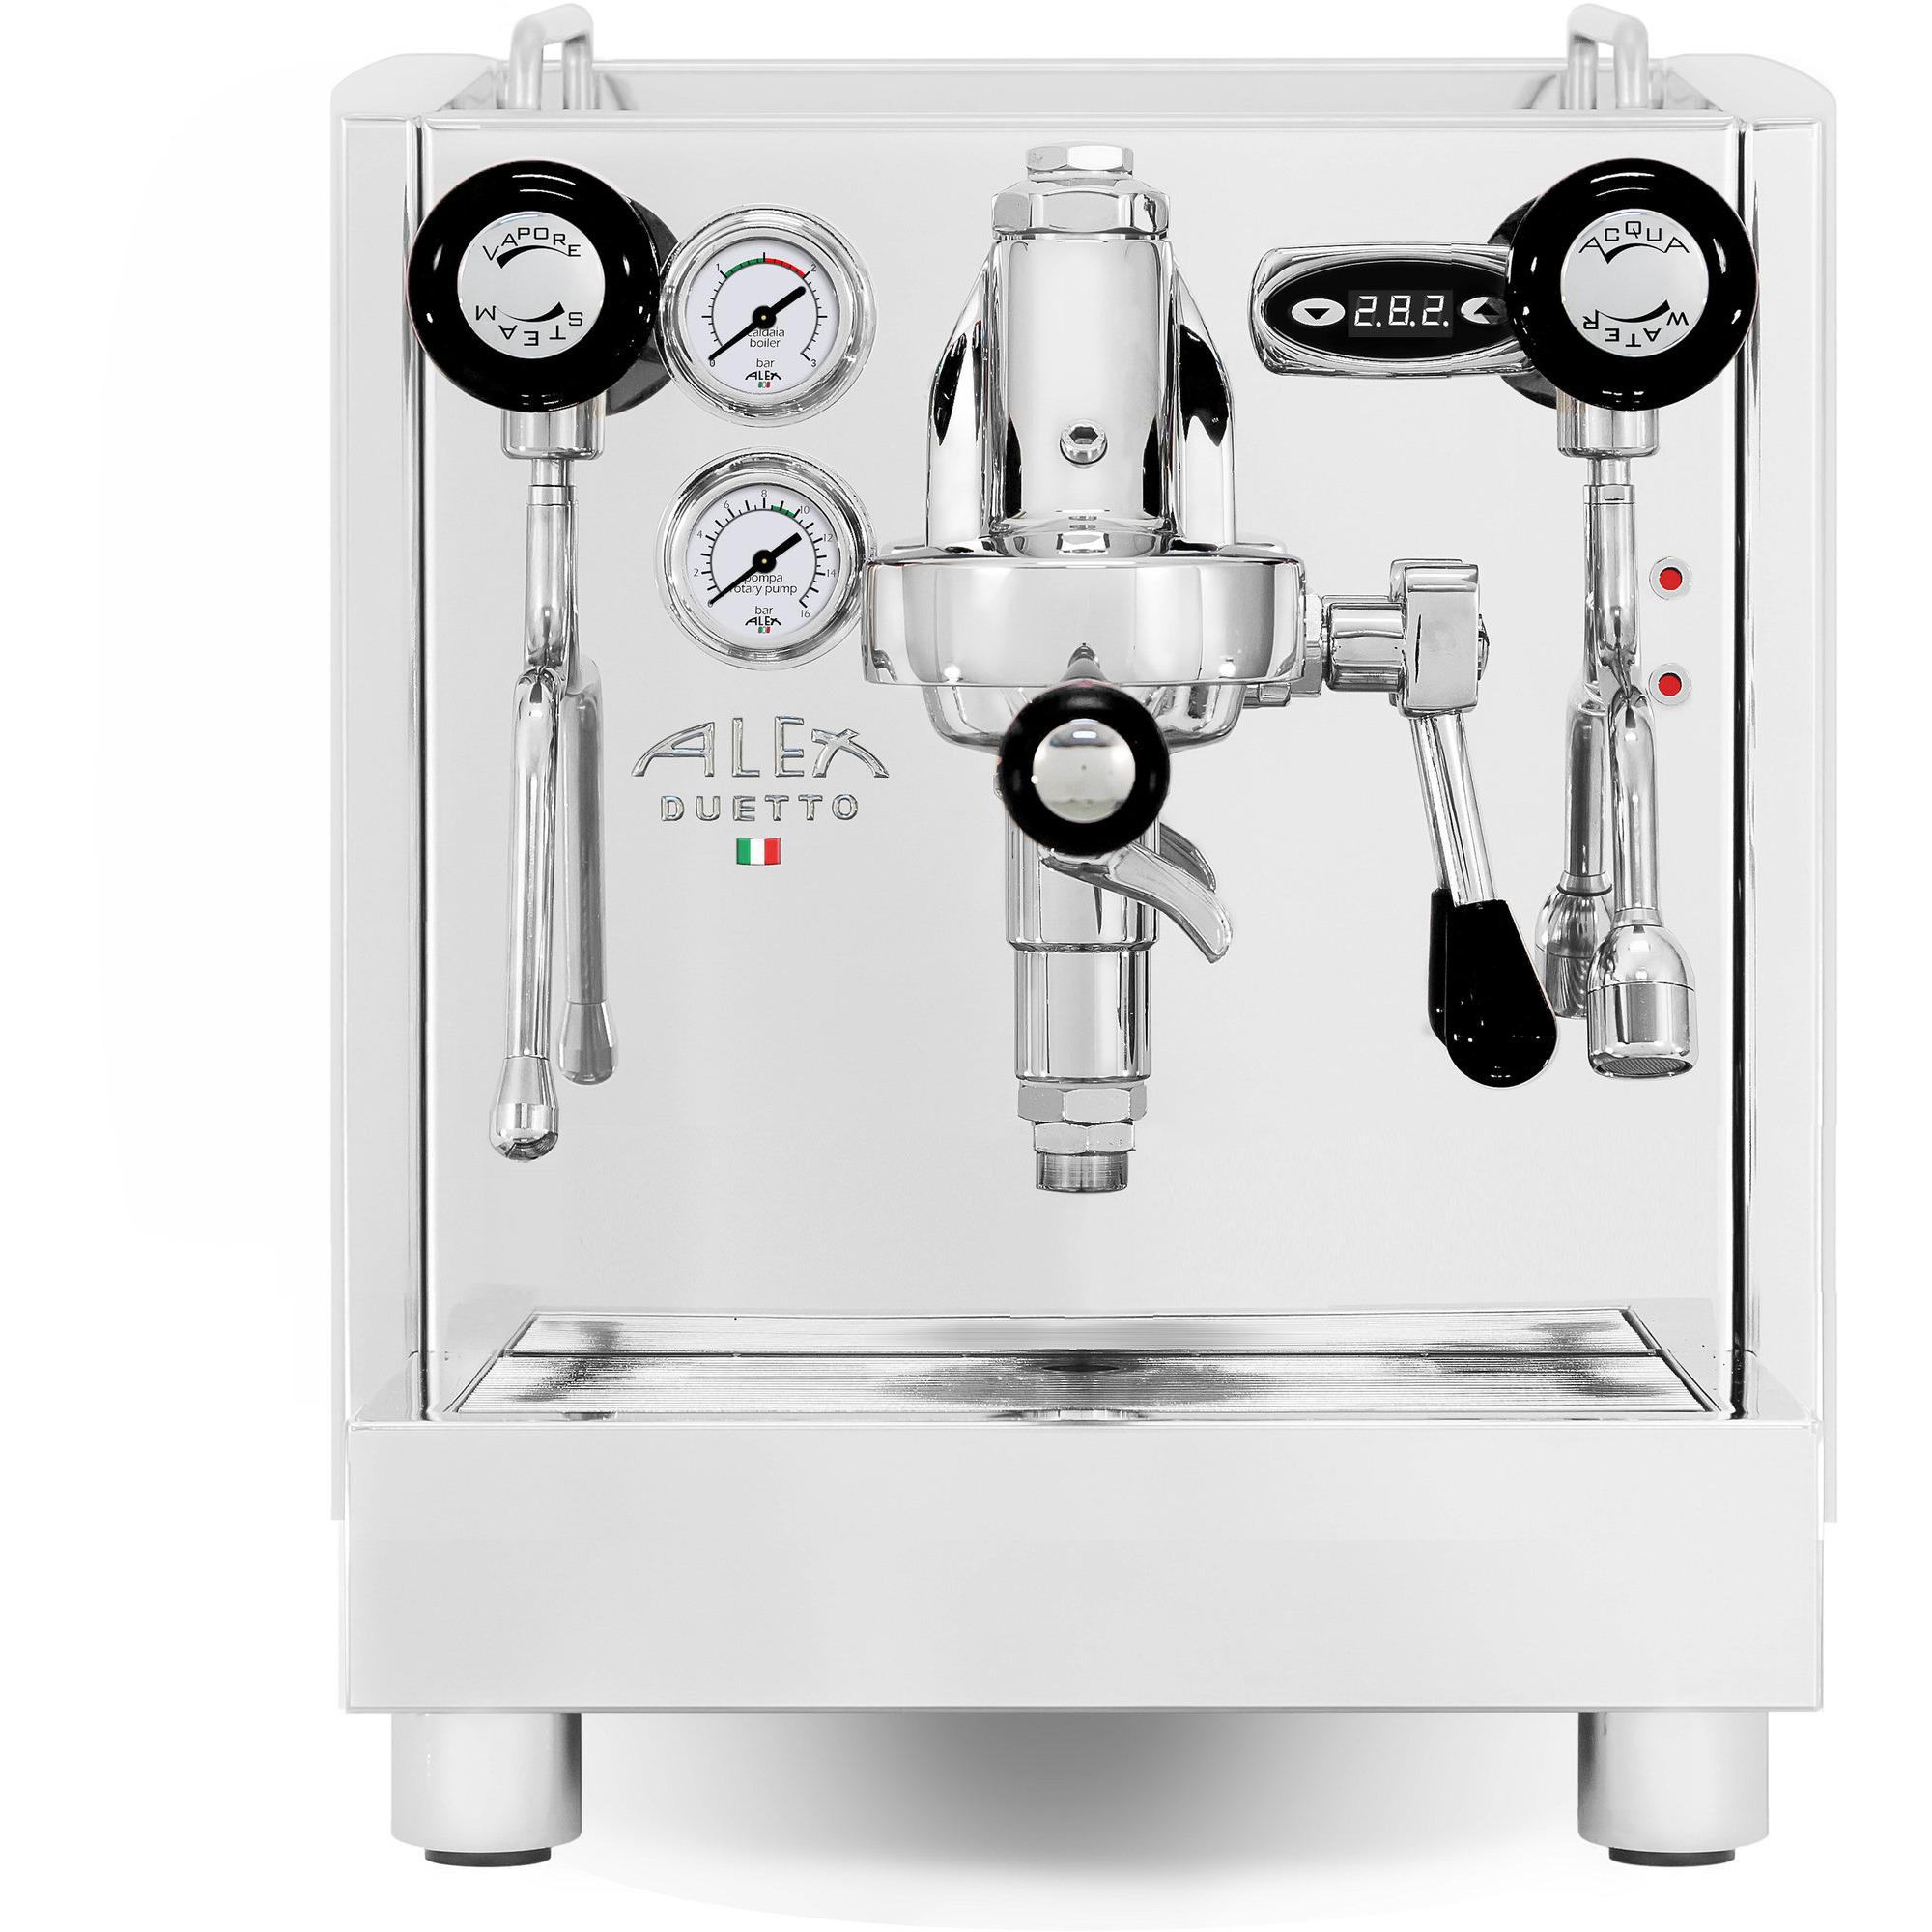 Izzo MyWay Alex Duetto IV Plus Inox E61 Espressomaskin